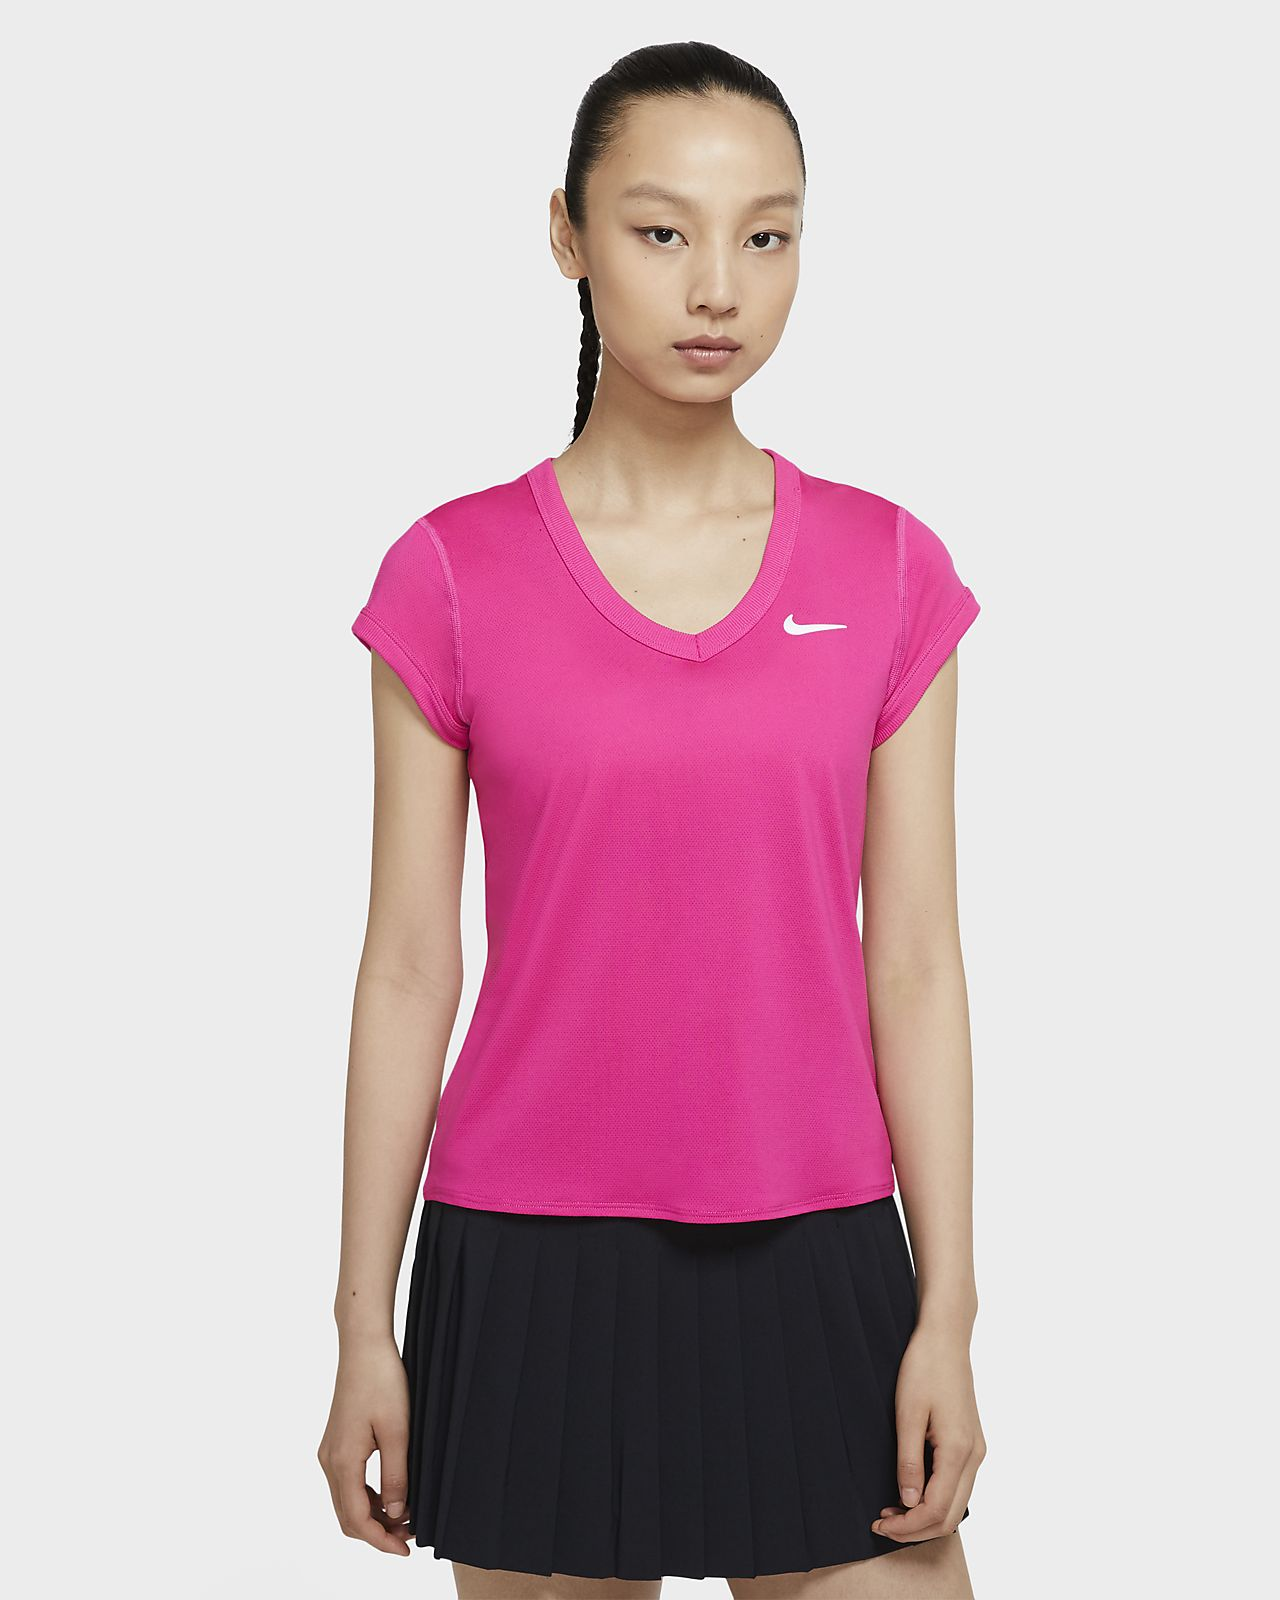 Prenda para la parte superior de tenis de manga corta para mujer NikeCourt Dri-FIT